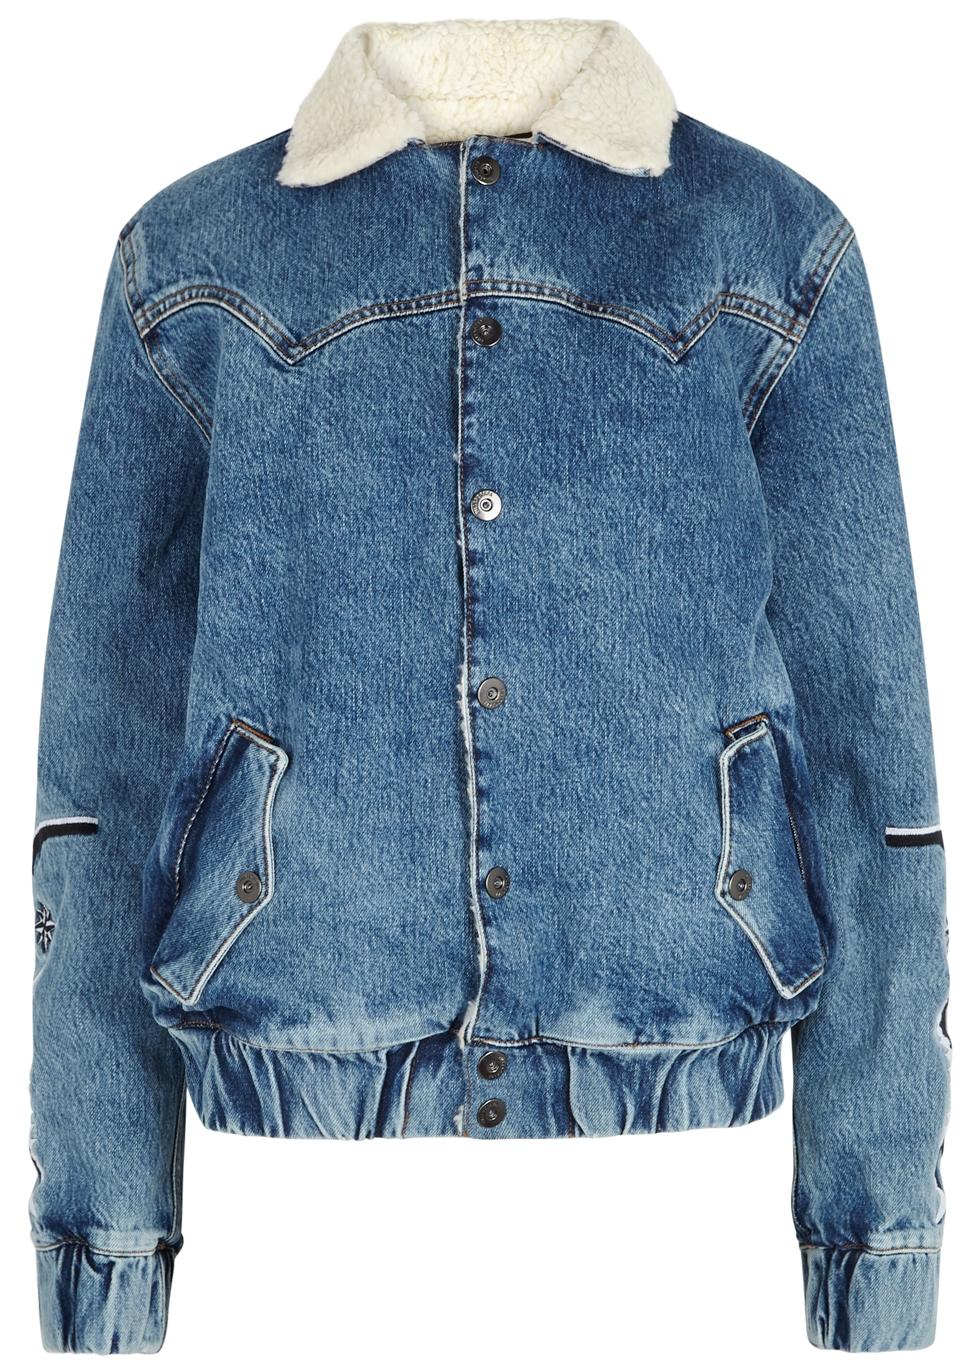 FILLES À PAPA Filles A Papa Janis Faux Shearling Collar Denim Jacket - Blue